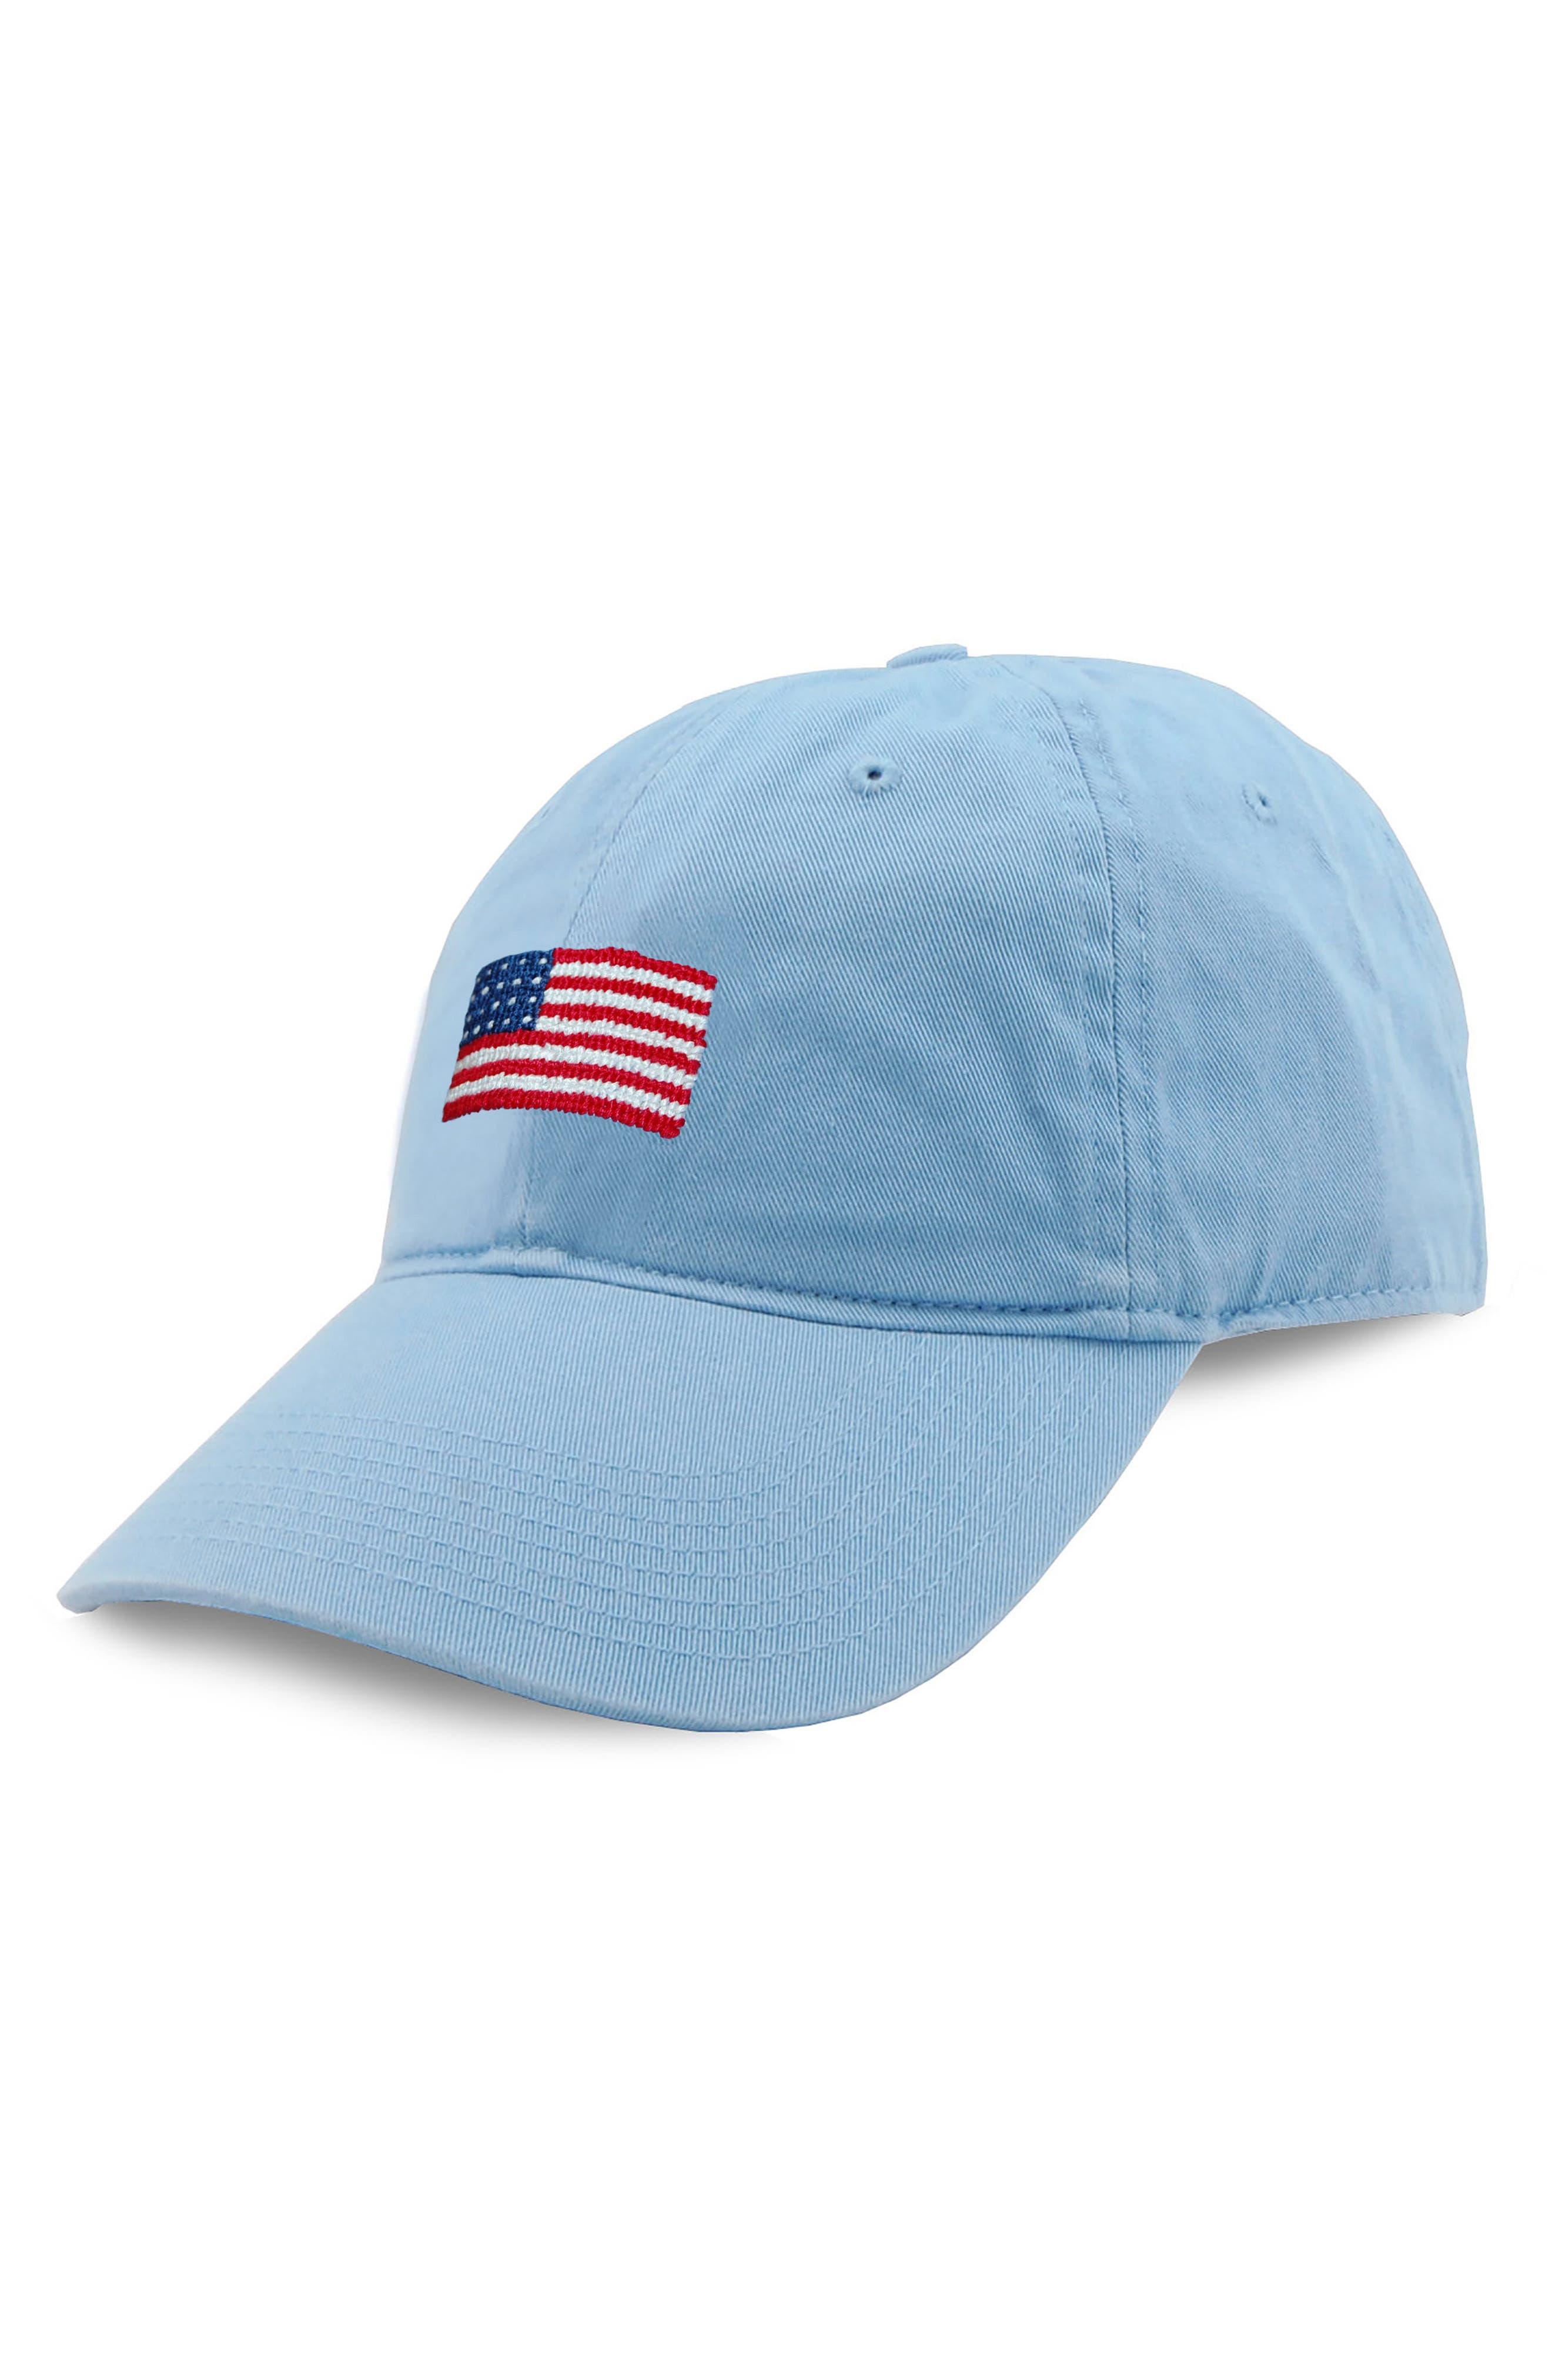 Alternate Image 1 Selected - Smathers & Branson 'American Flag' Baseball Cap